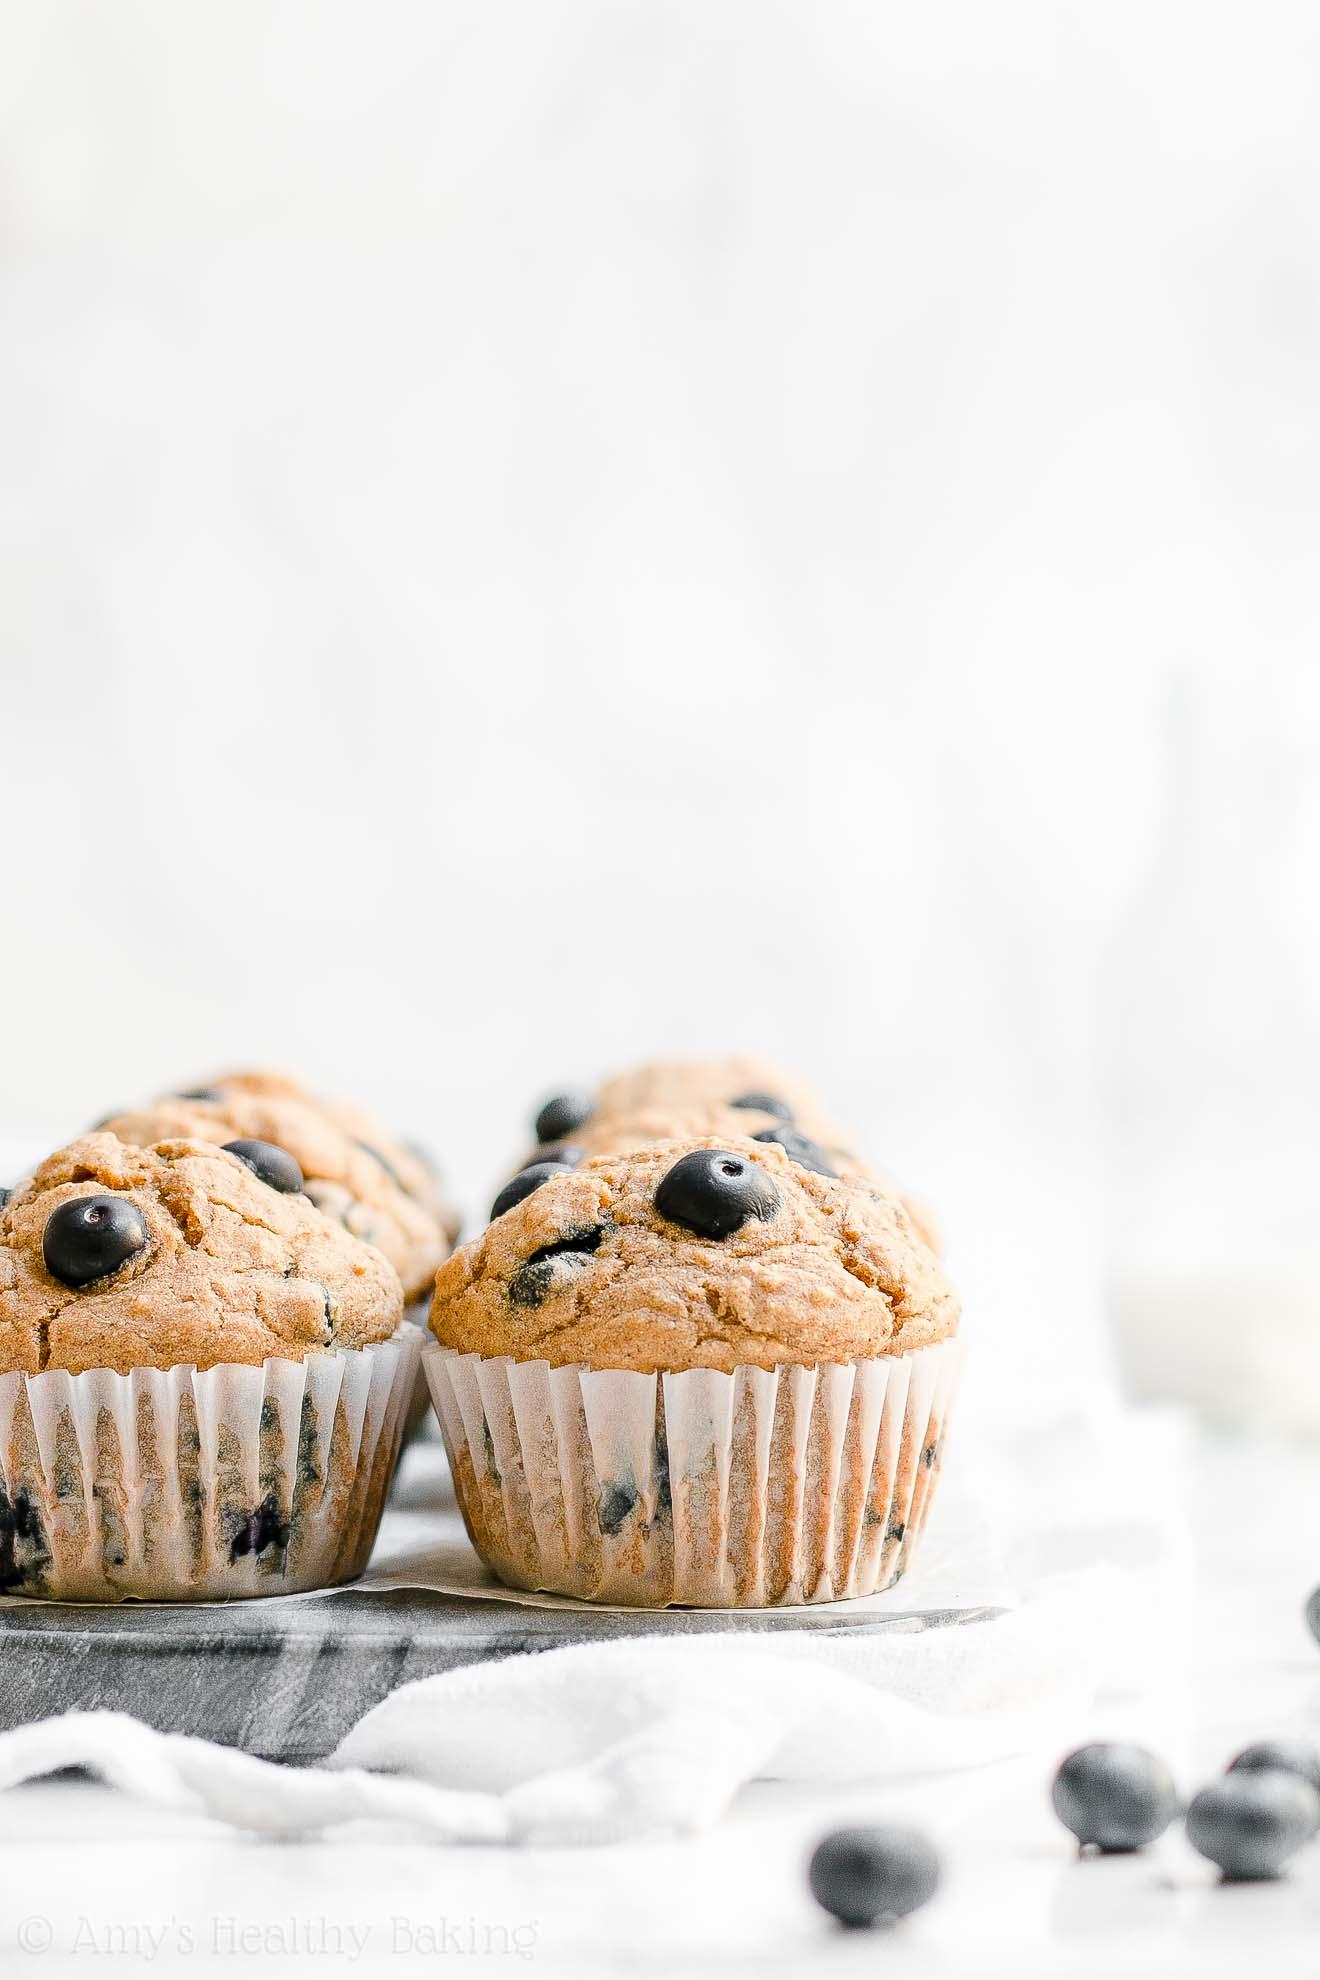 ULTIMATE Easy Healthy Greek Yogurt Blueberry Oatmeal Muffins